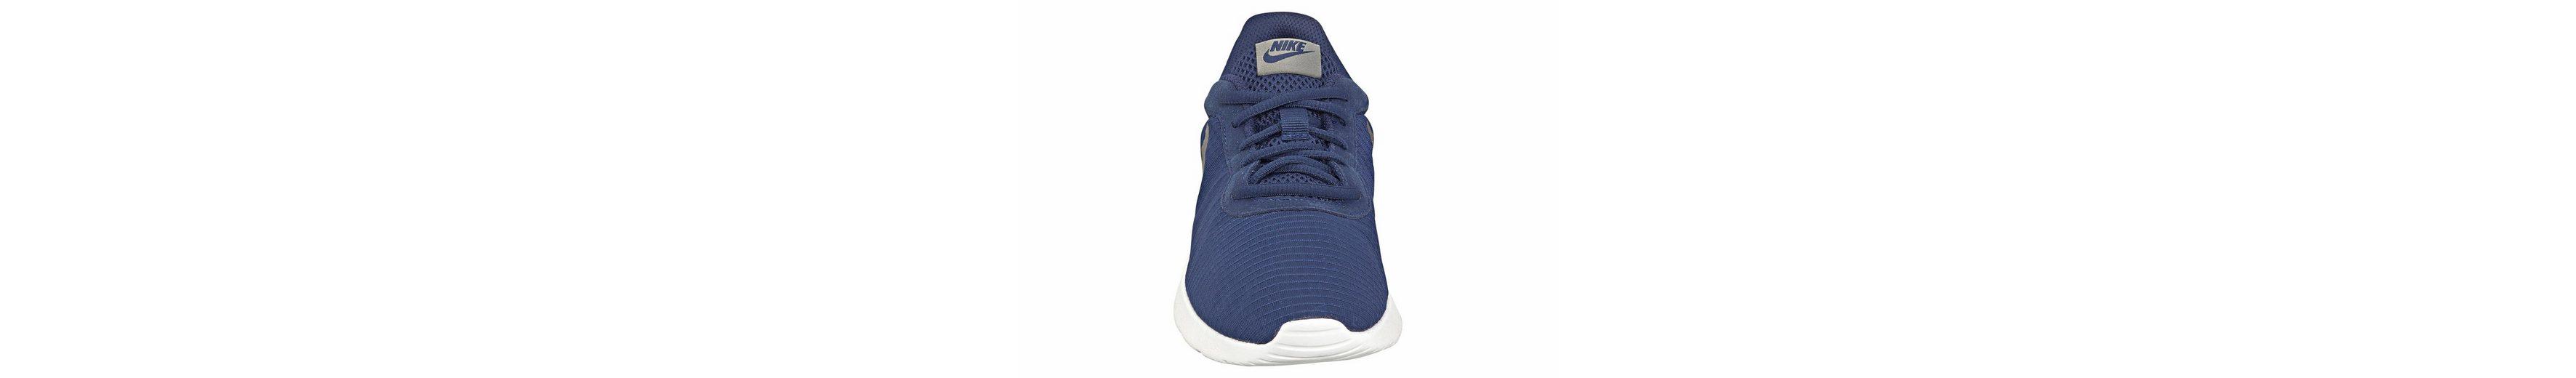 Sneaker Wmns Wmns Sportswear Tanjun Sportswear SE Nike Tanjun Nike SE zxznCSqwP